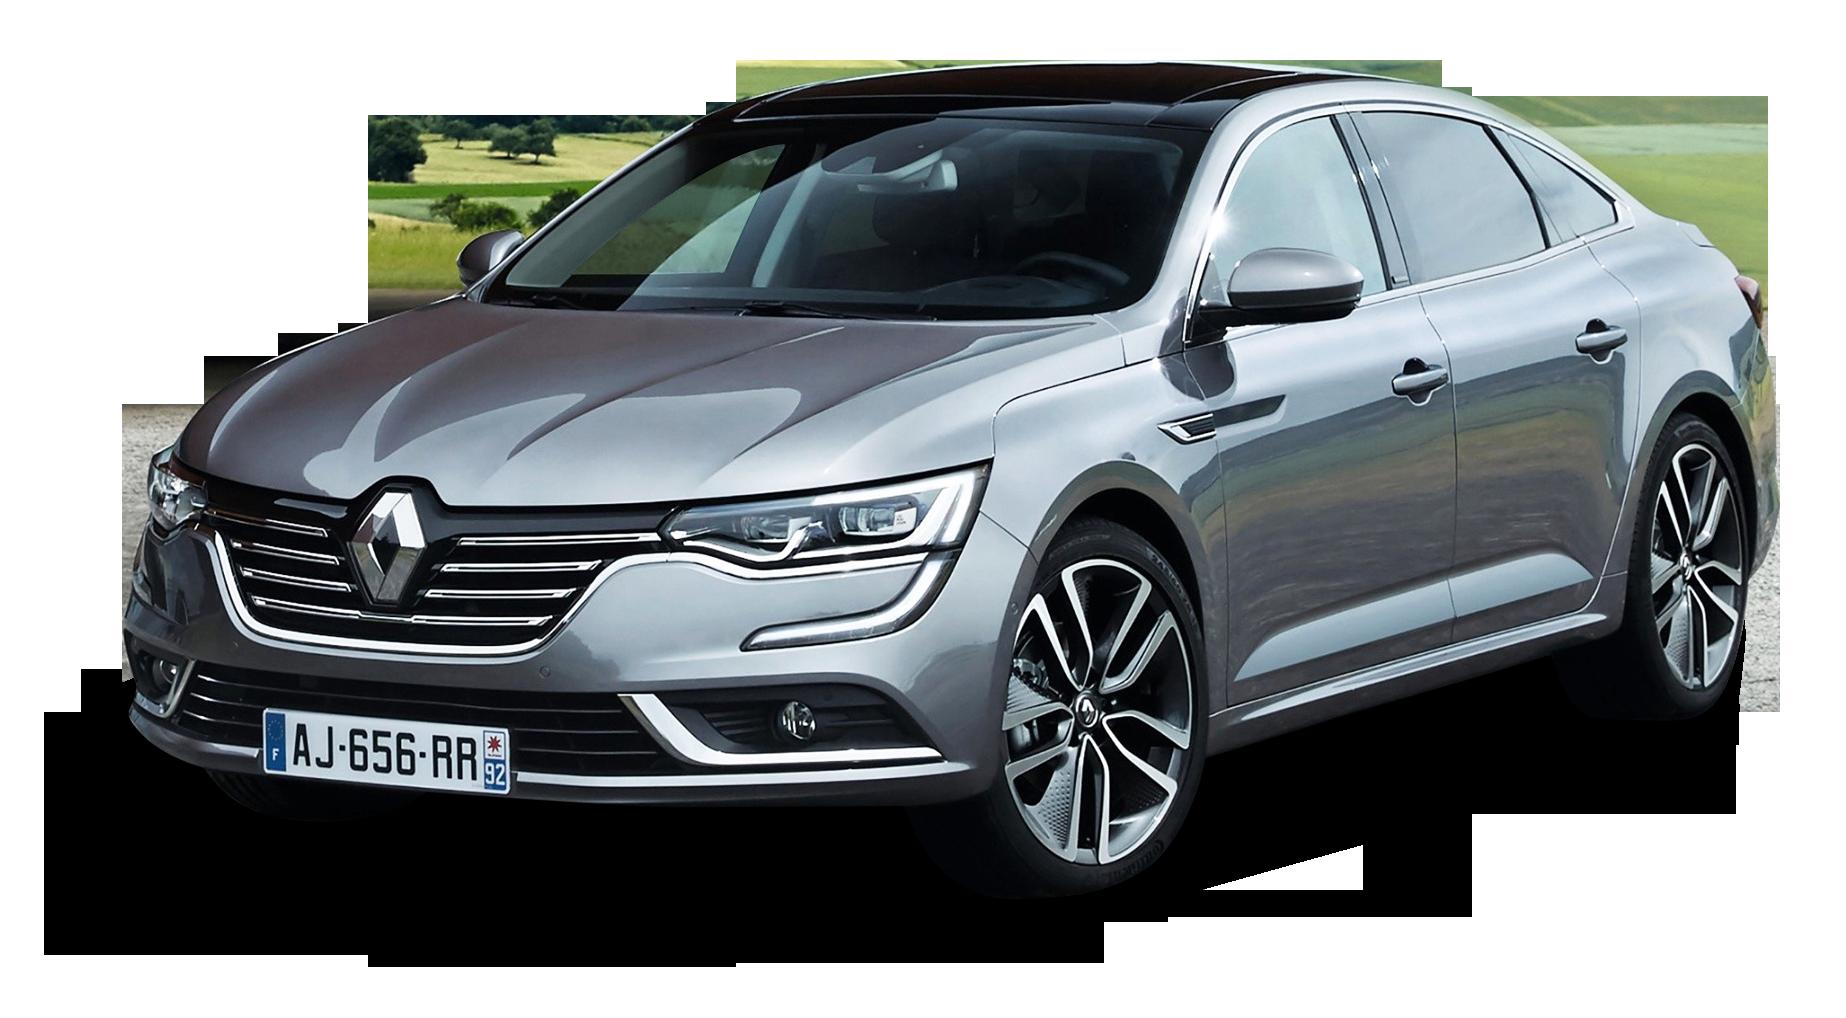 Renault Talisman Car PNG Image.